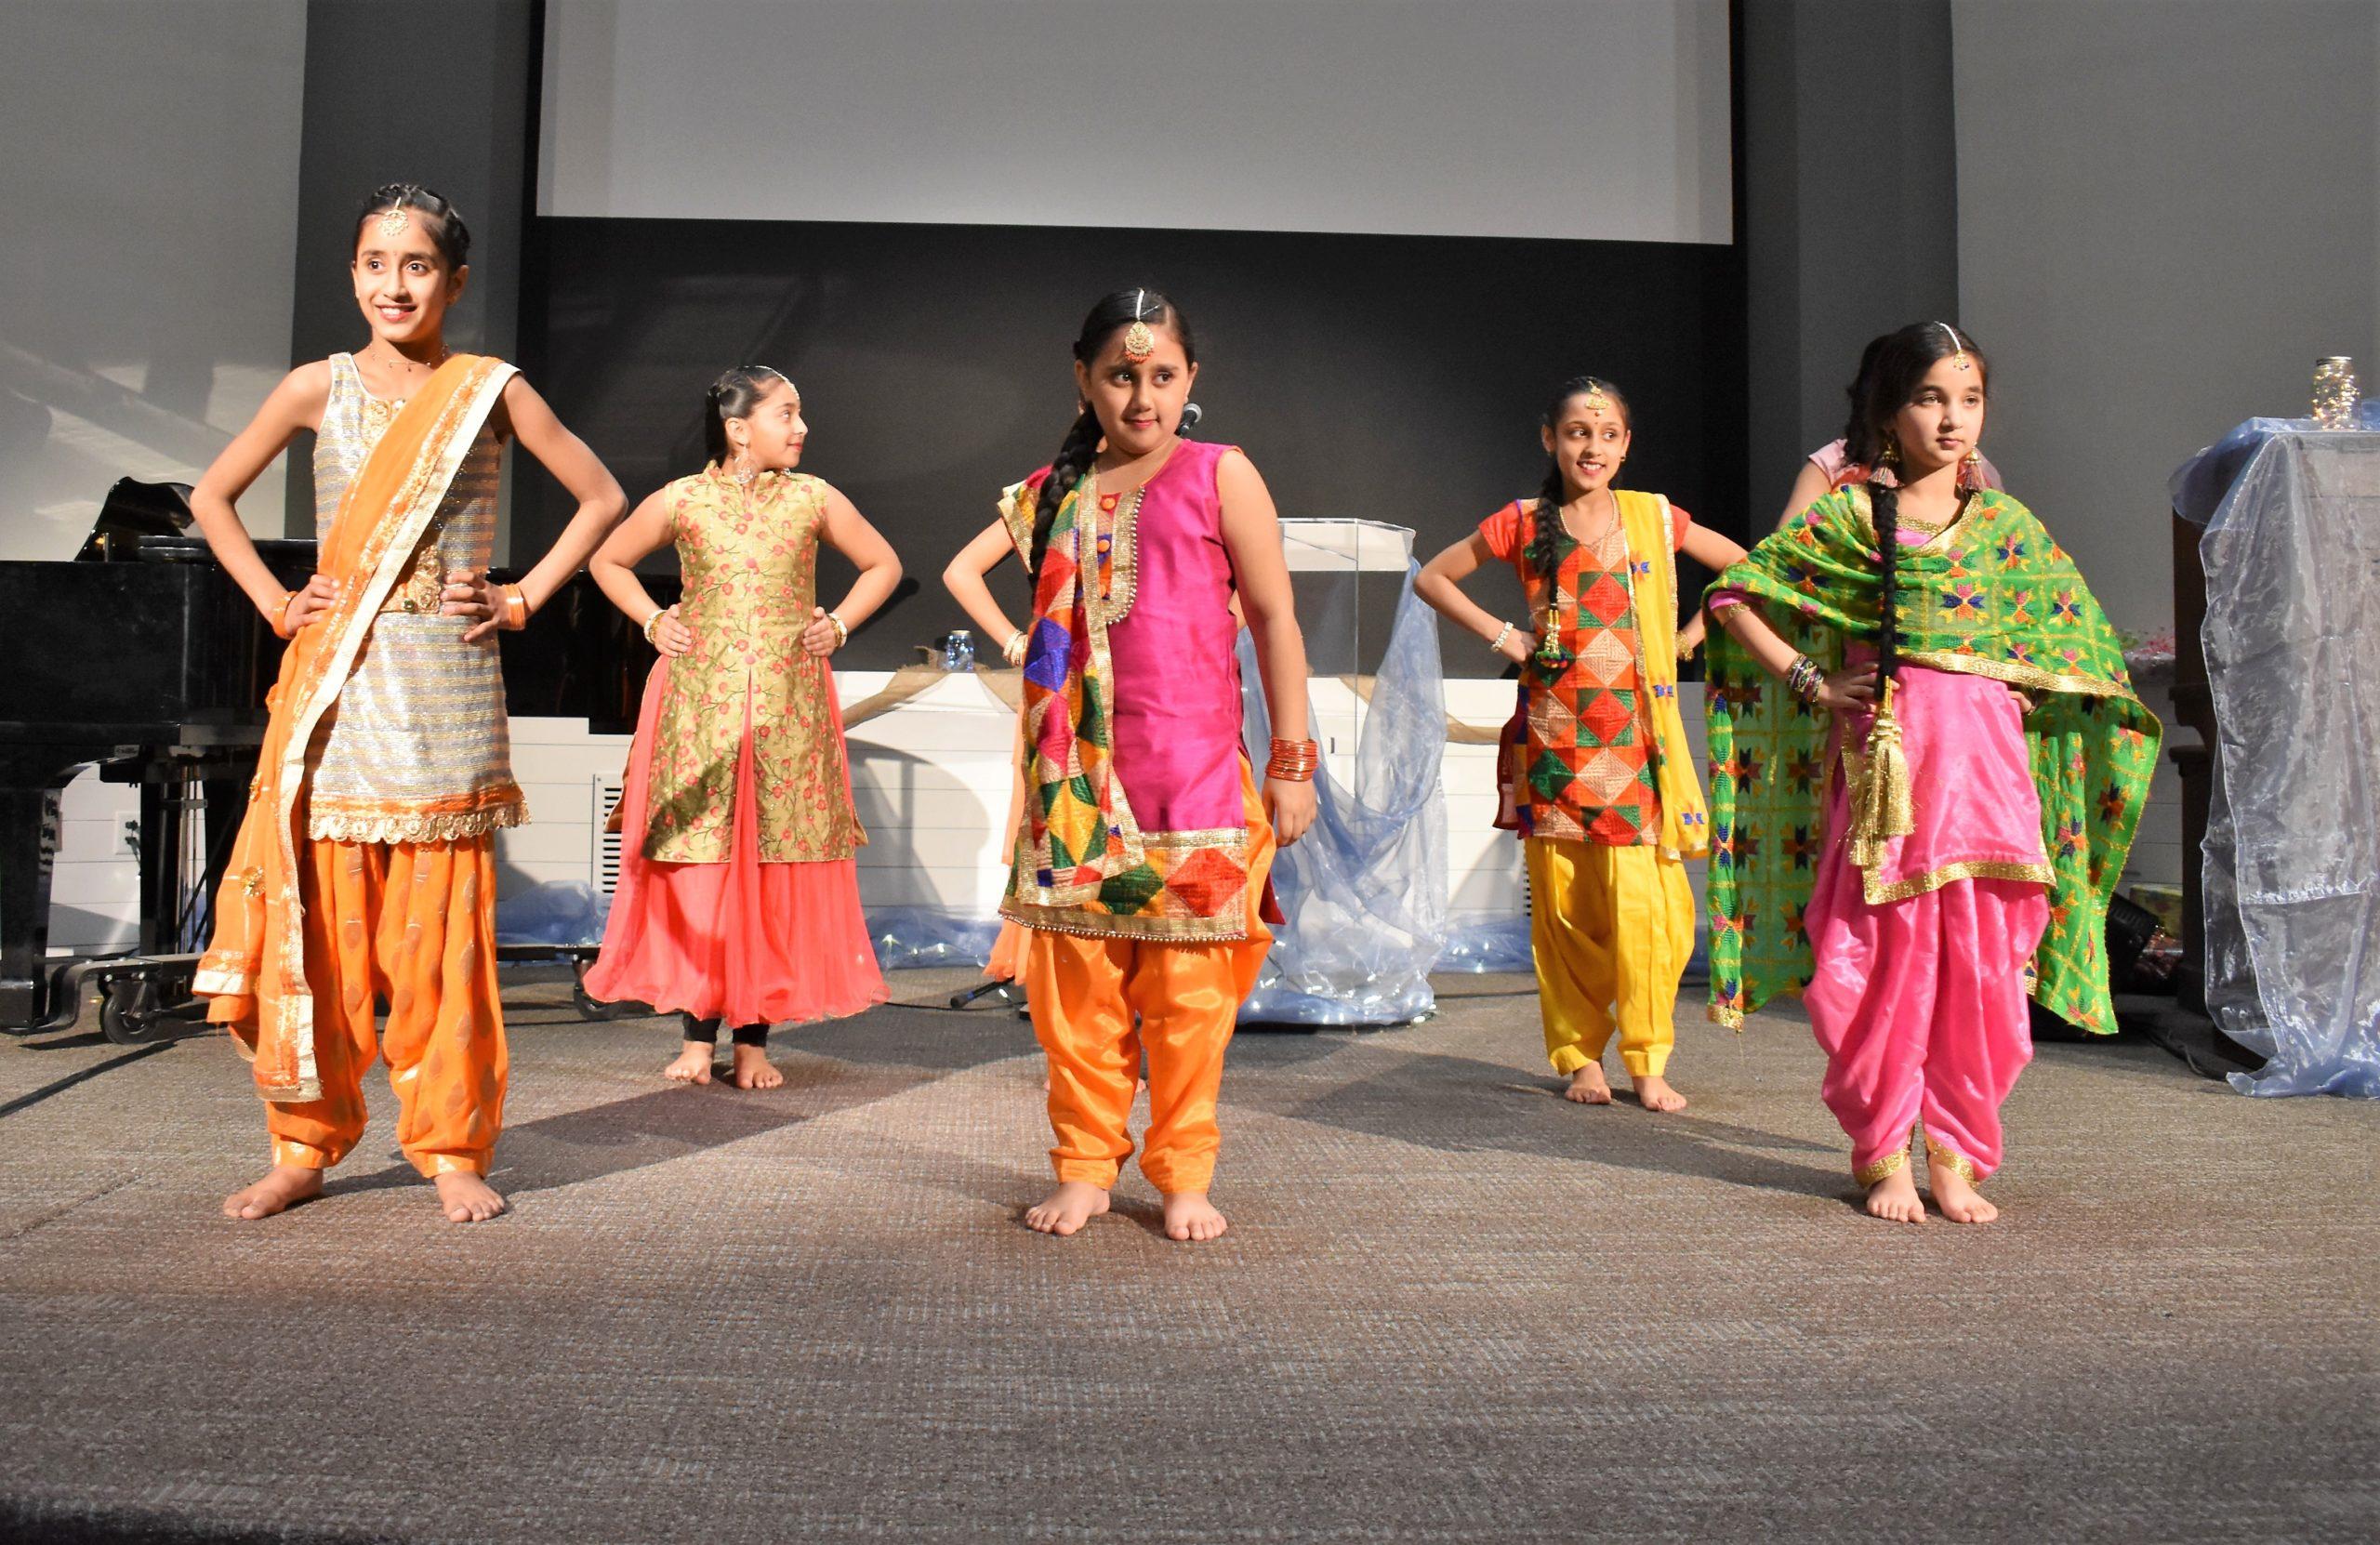 Bhangra Dancers from John Maclure School